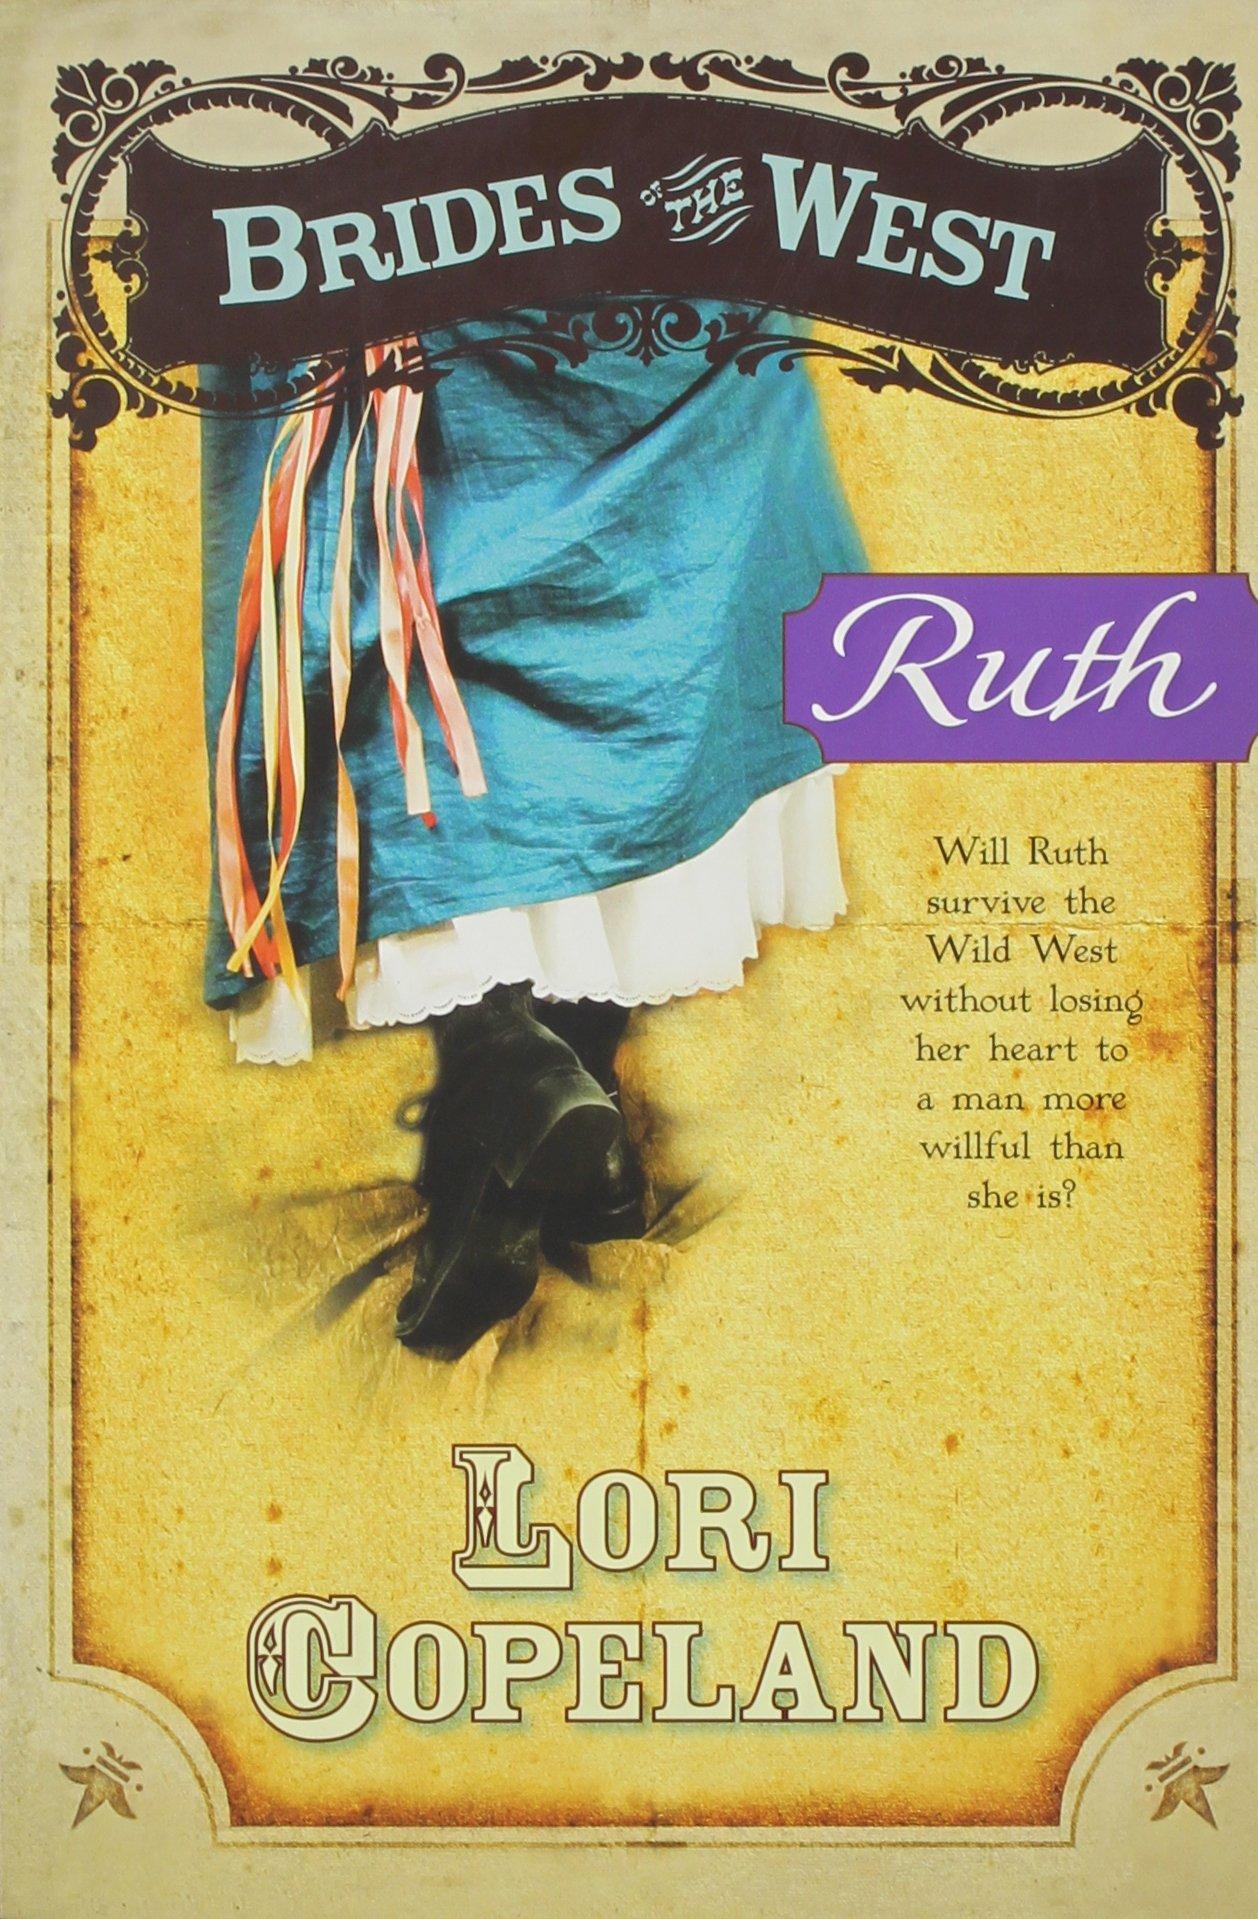 Ruth (brides Of The West #5): Lori Copeland: 9780793441297: Amazon:  Books